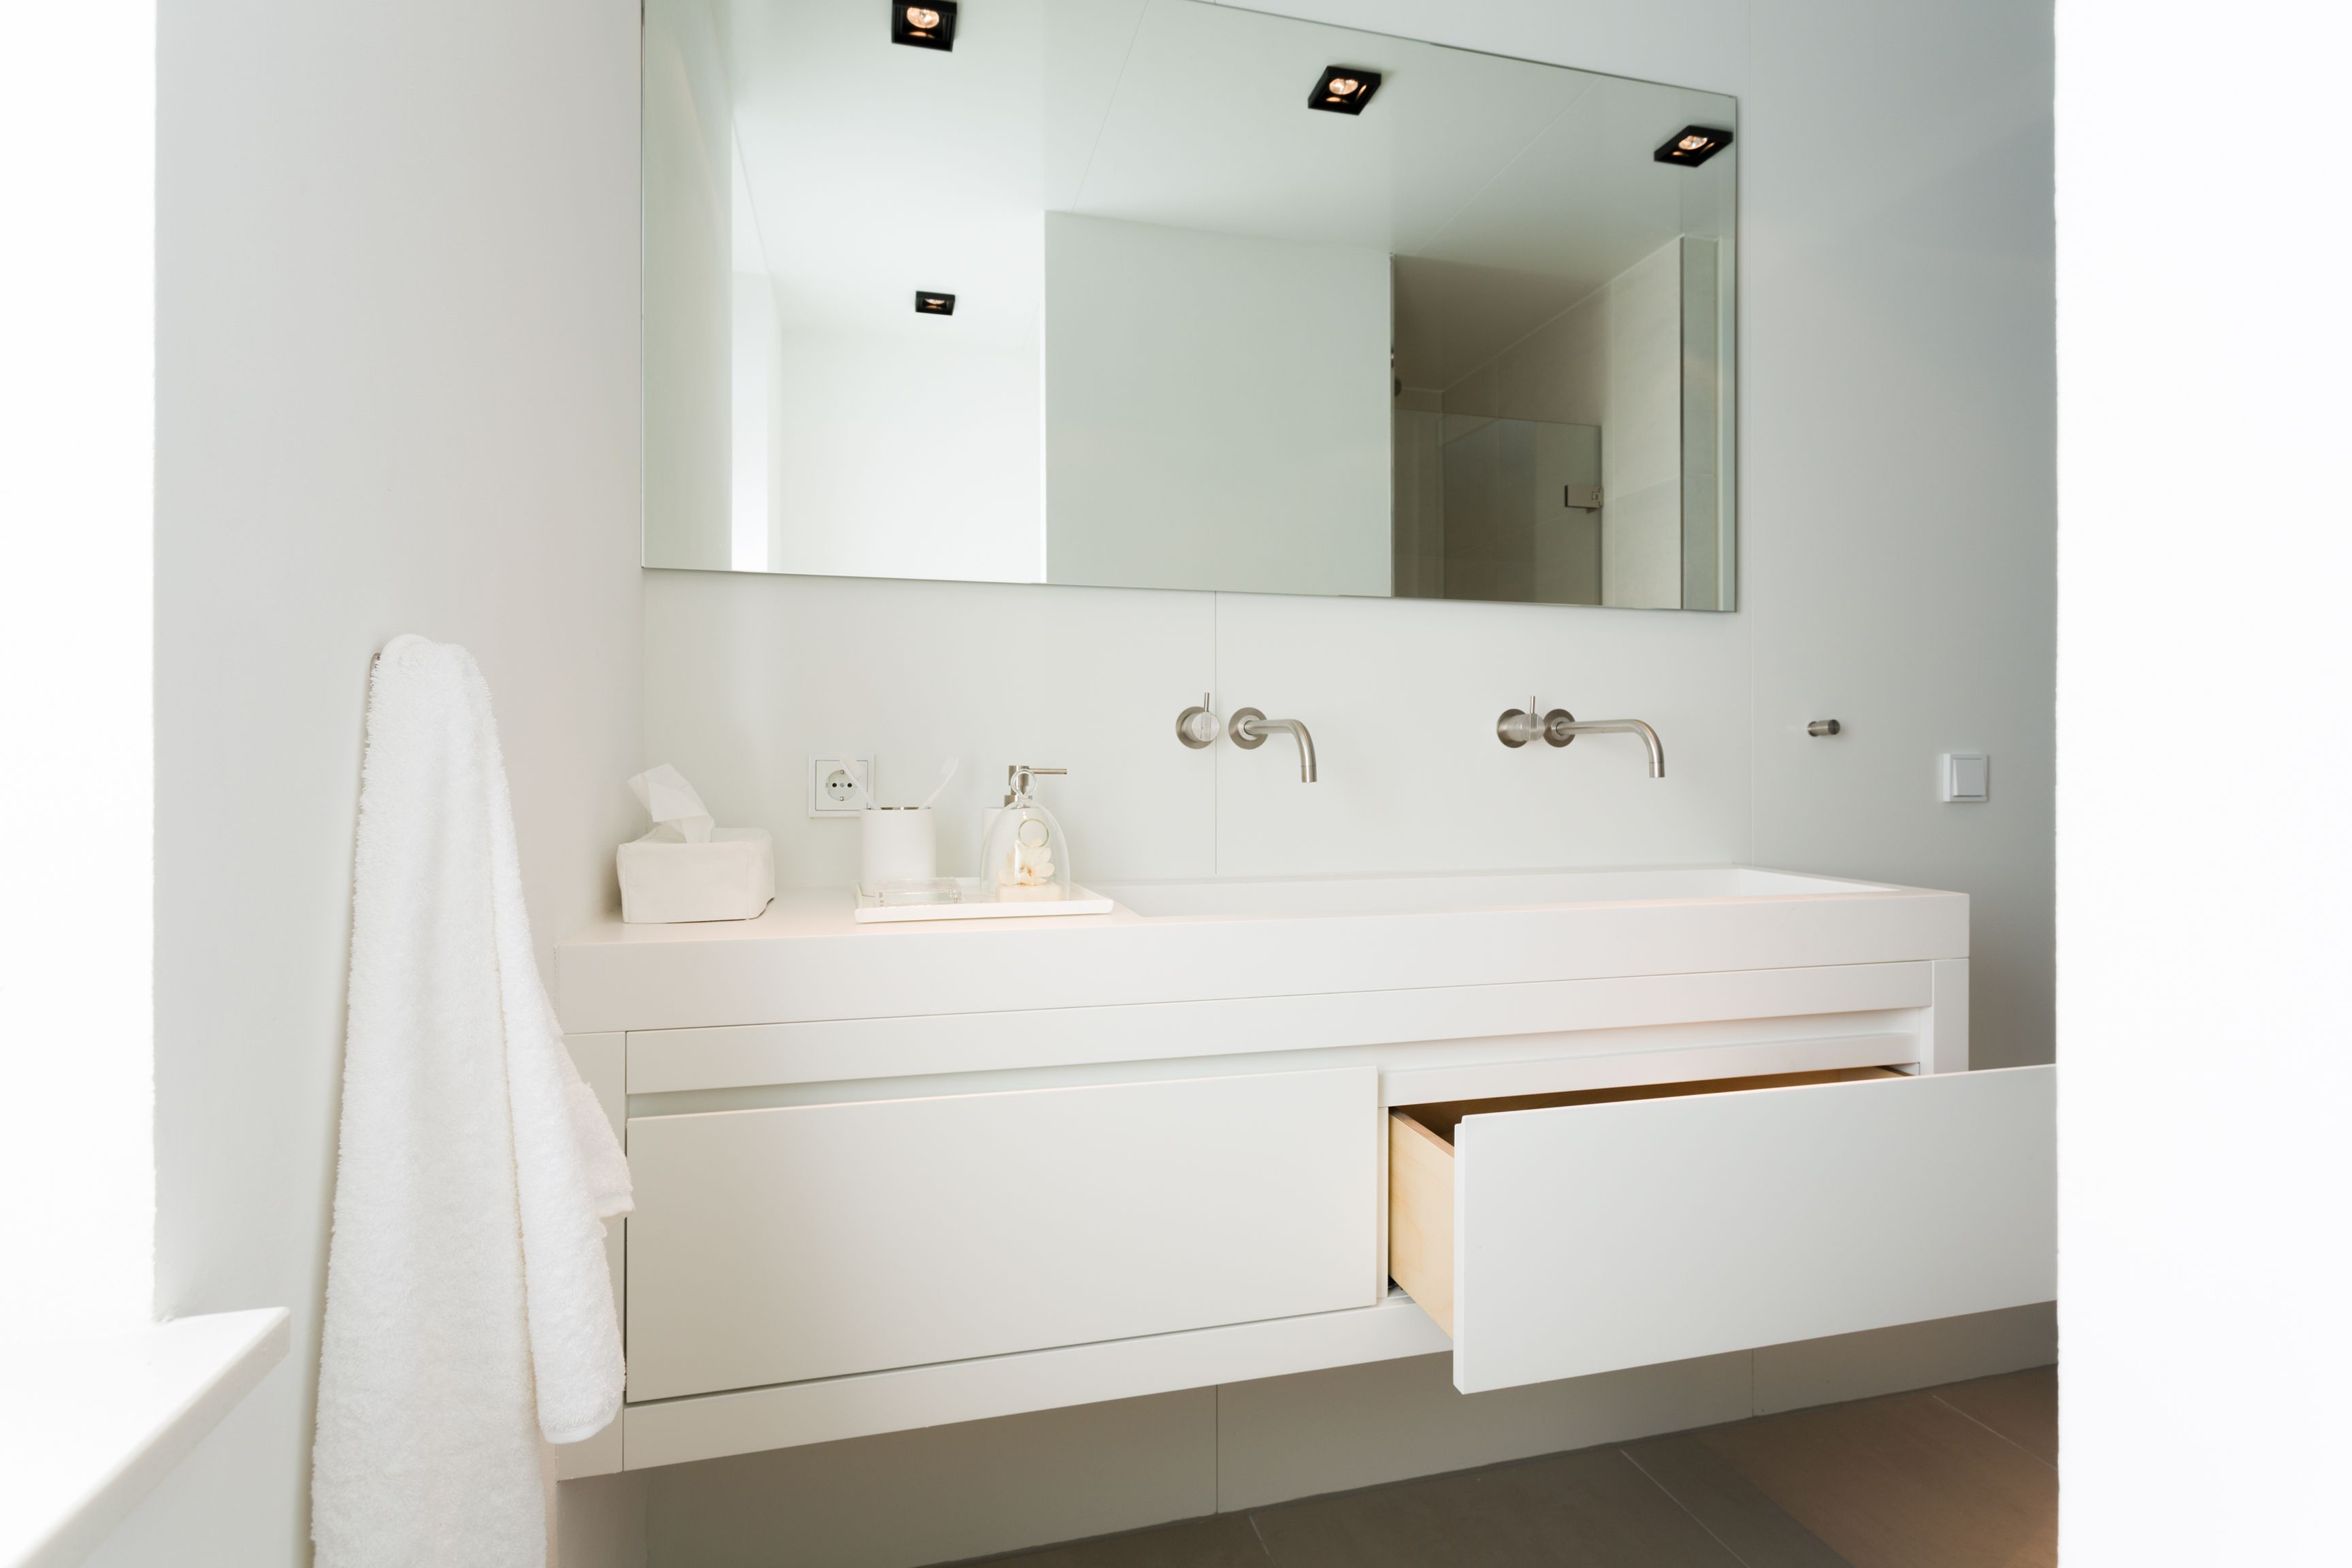 Prachtig witte badkamer #prefab www.mycuby.nl   Ontwerpen prefab ...